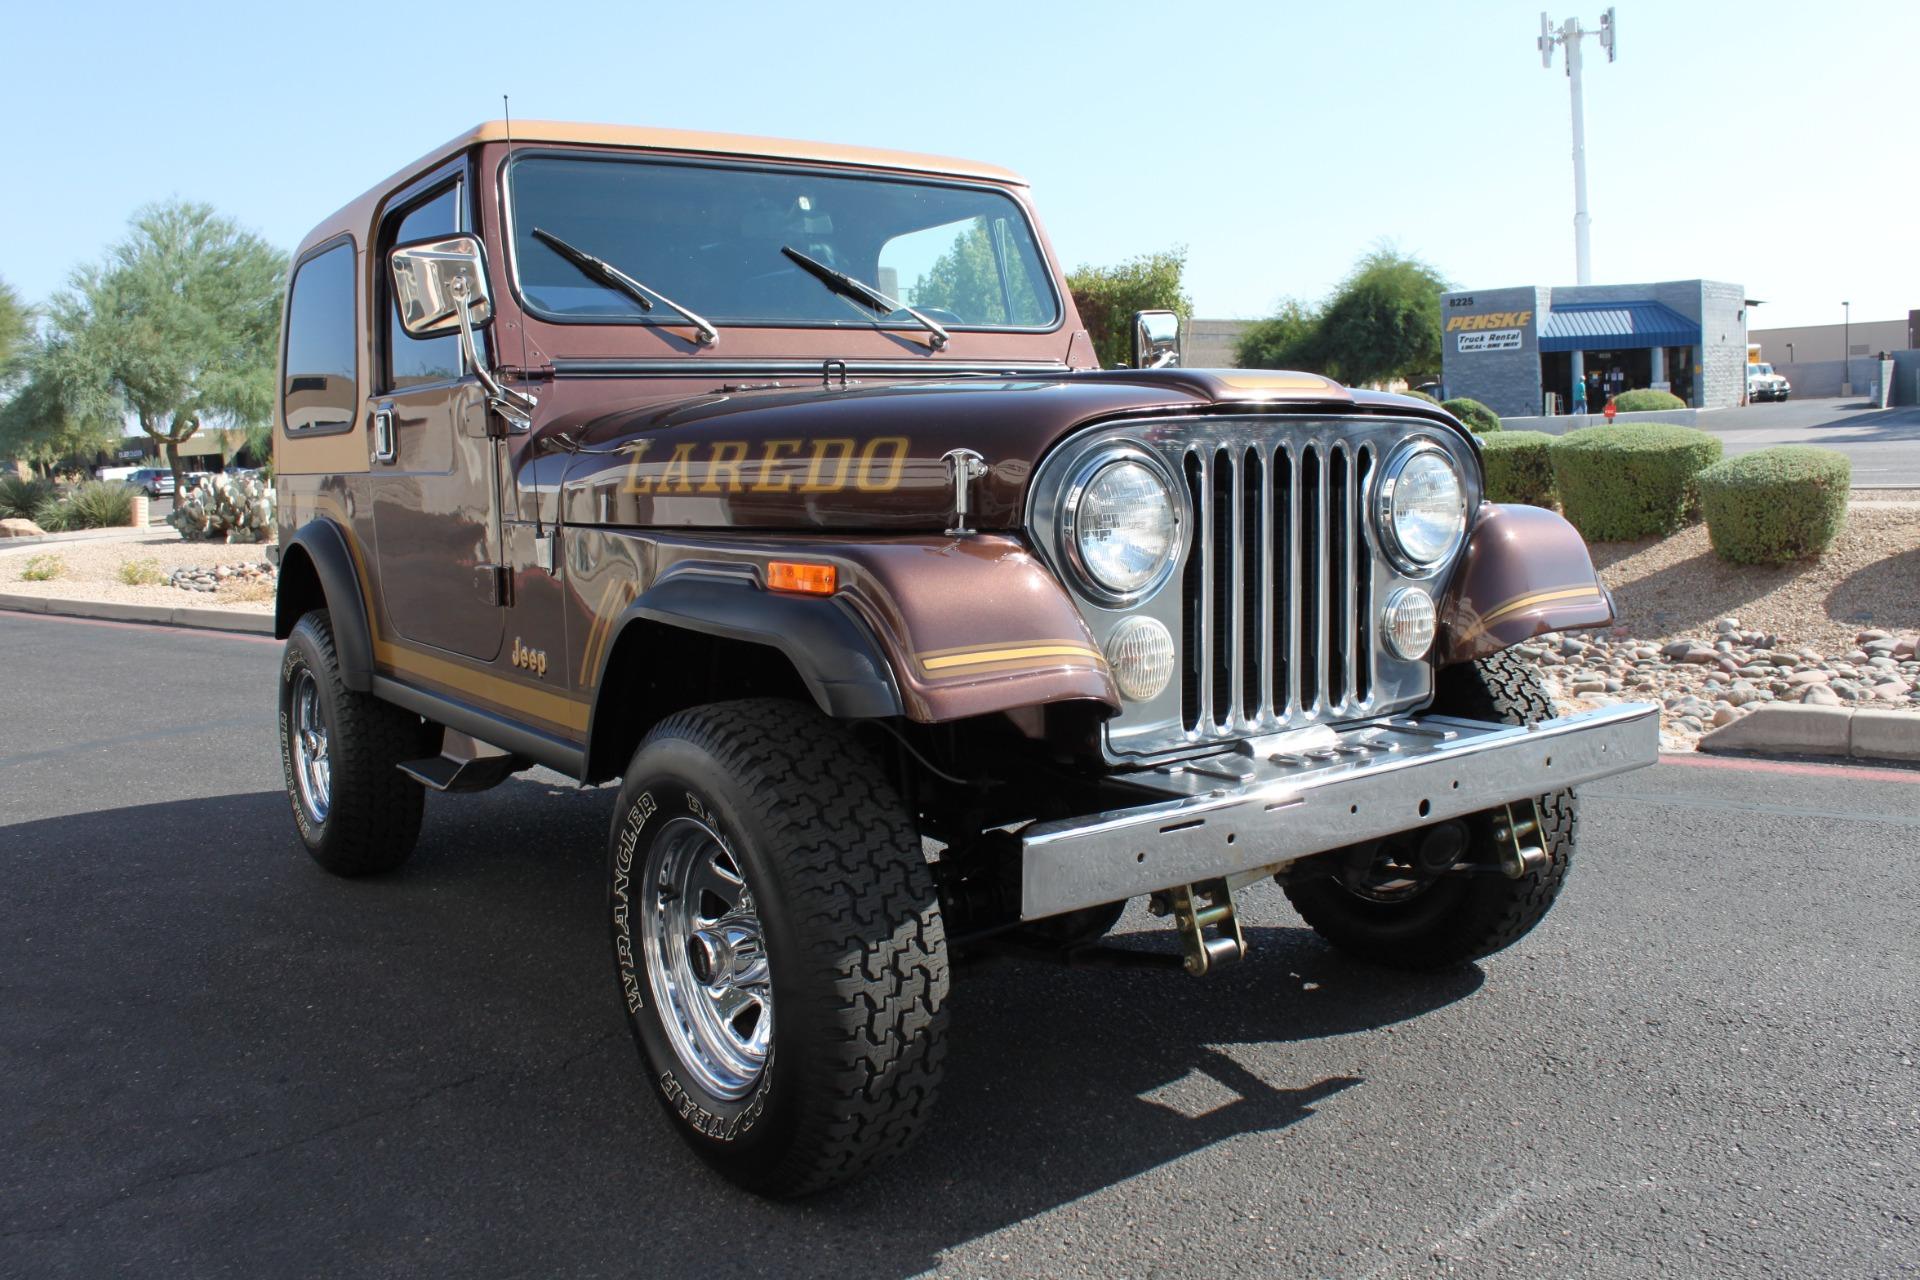 Used-1985-Jeep-CJ-7-Laredo-4WD-Mercedes-Benz